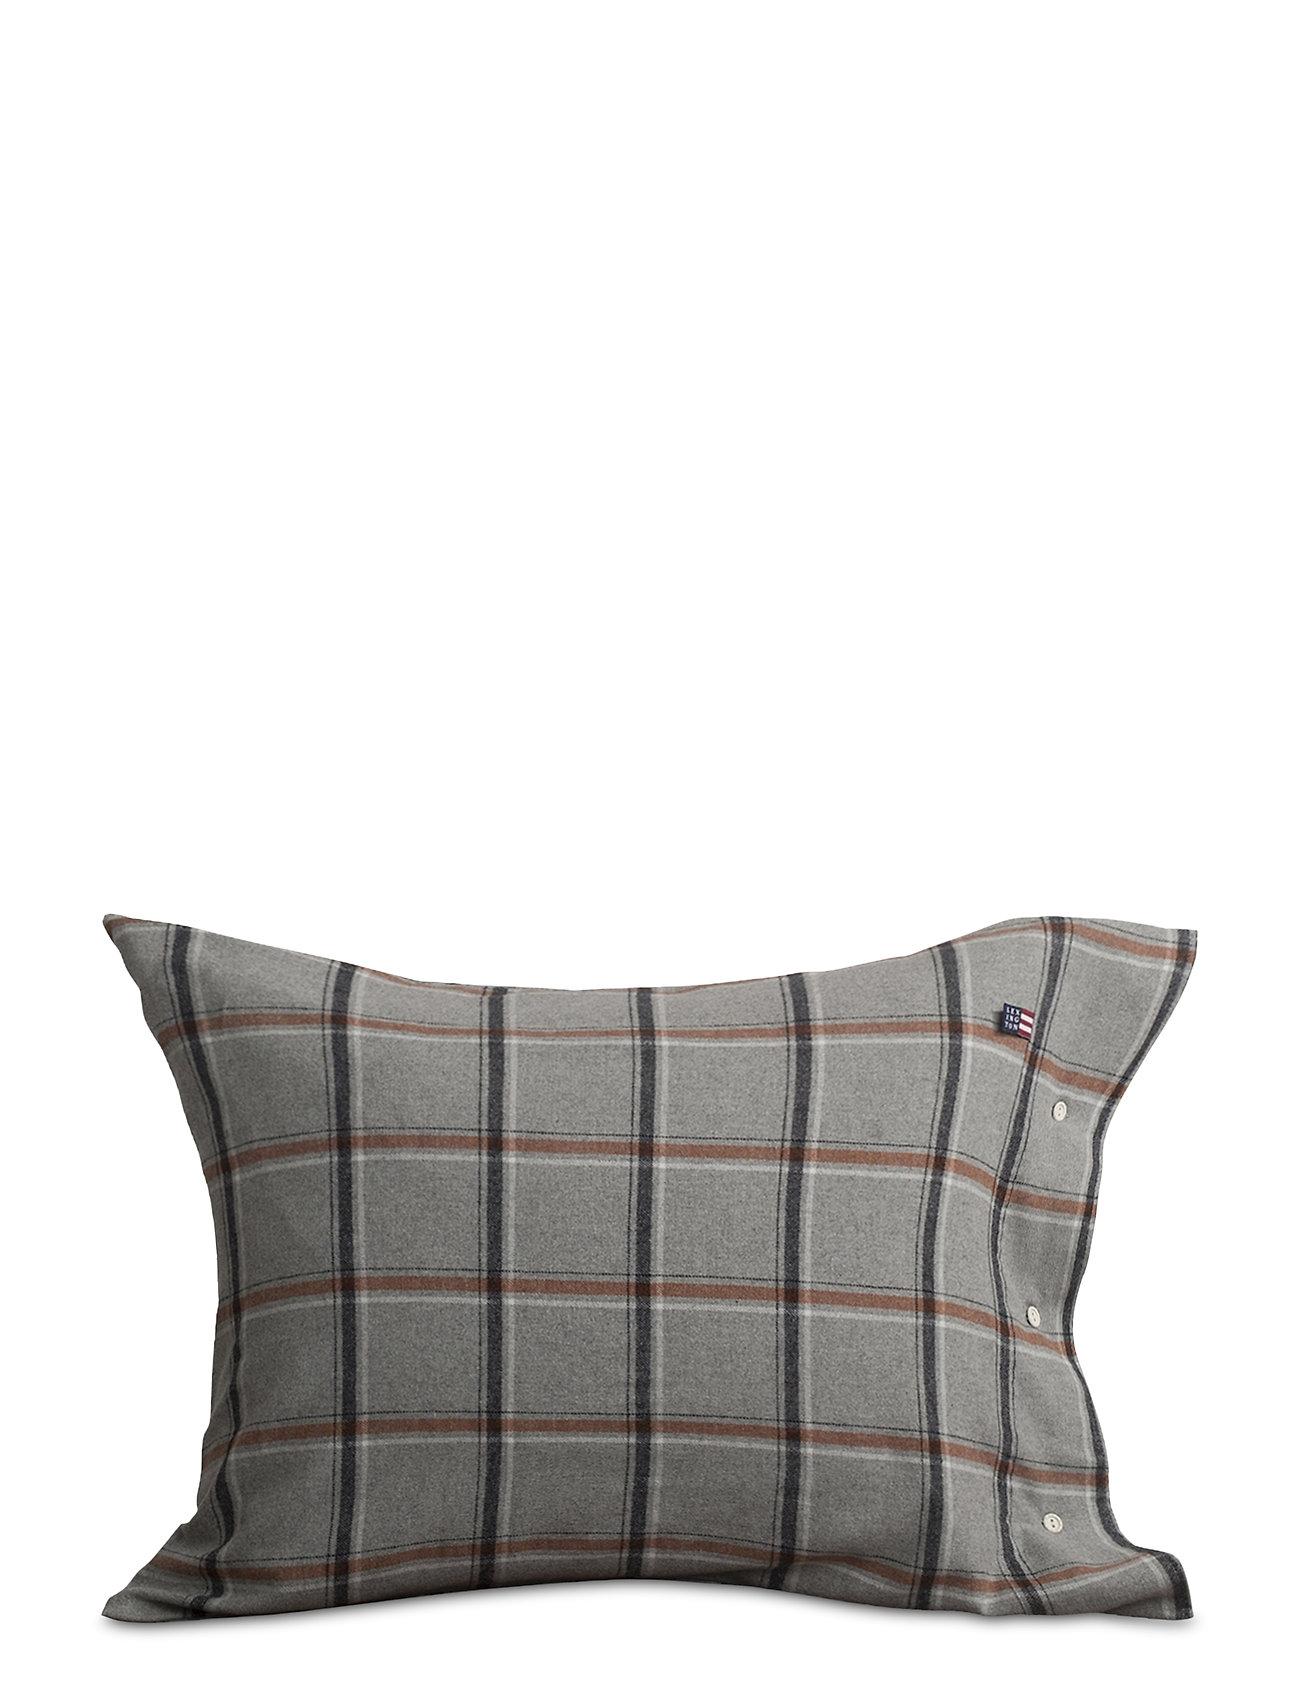 Lexington Home Checked Flannel Pillowcase - LT GRAY/WHITE/RUST CHECK